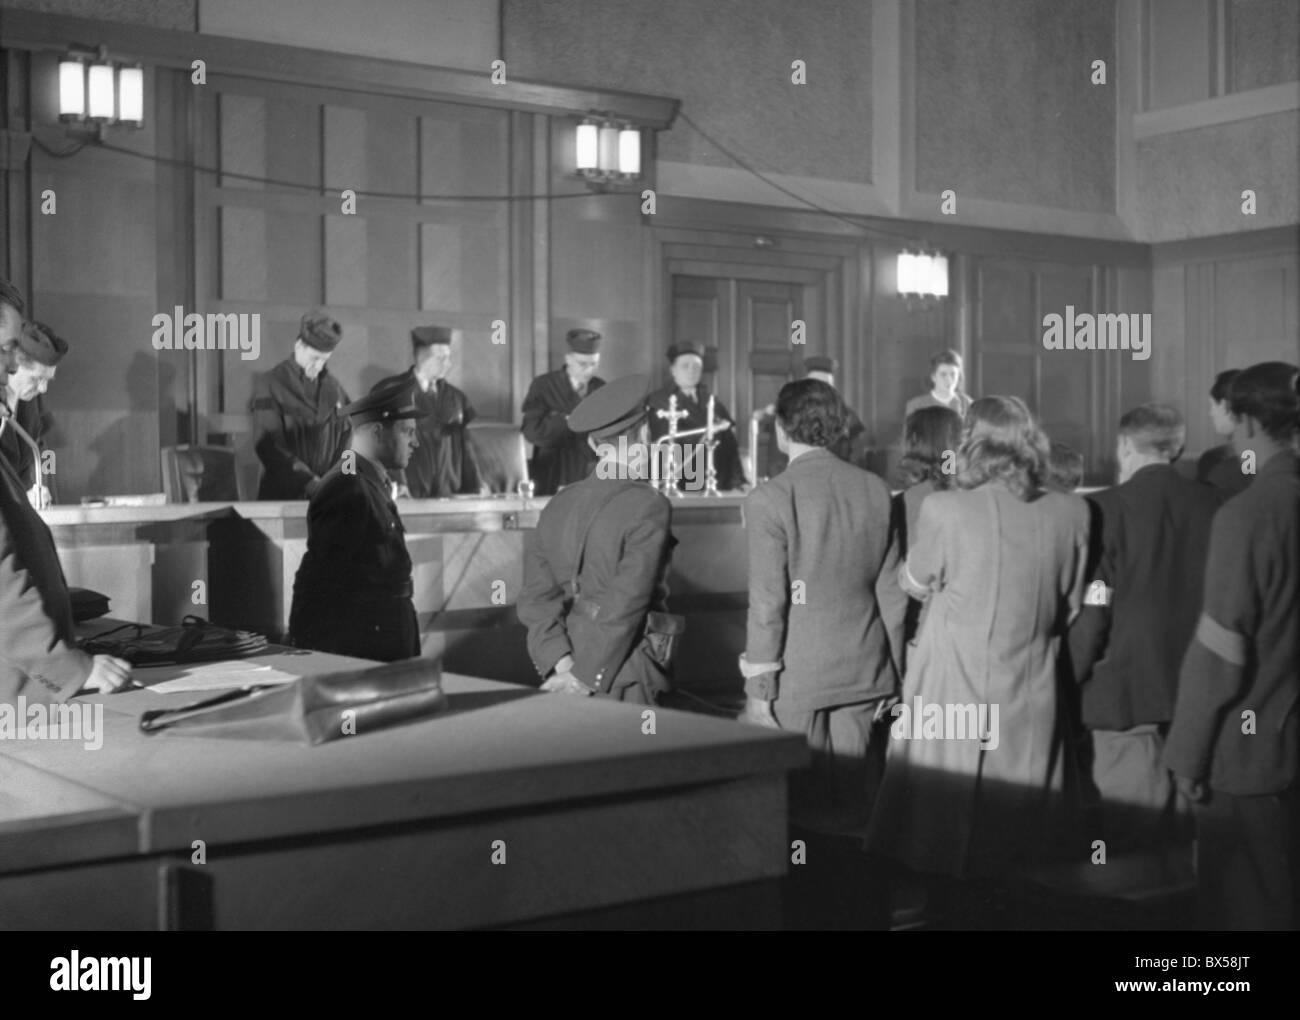 Spy trial, enemies of state, spies, wrongly accused - Stock Image